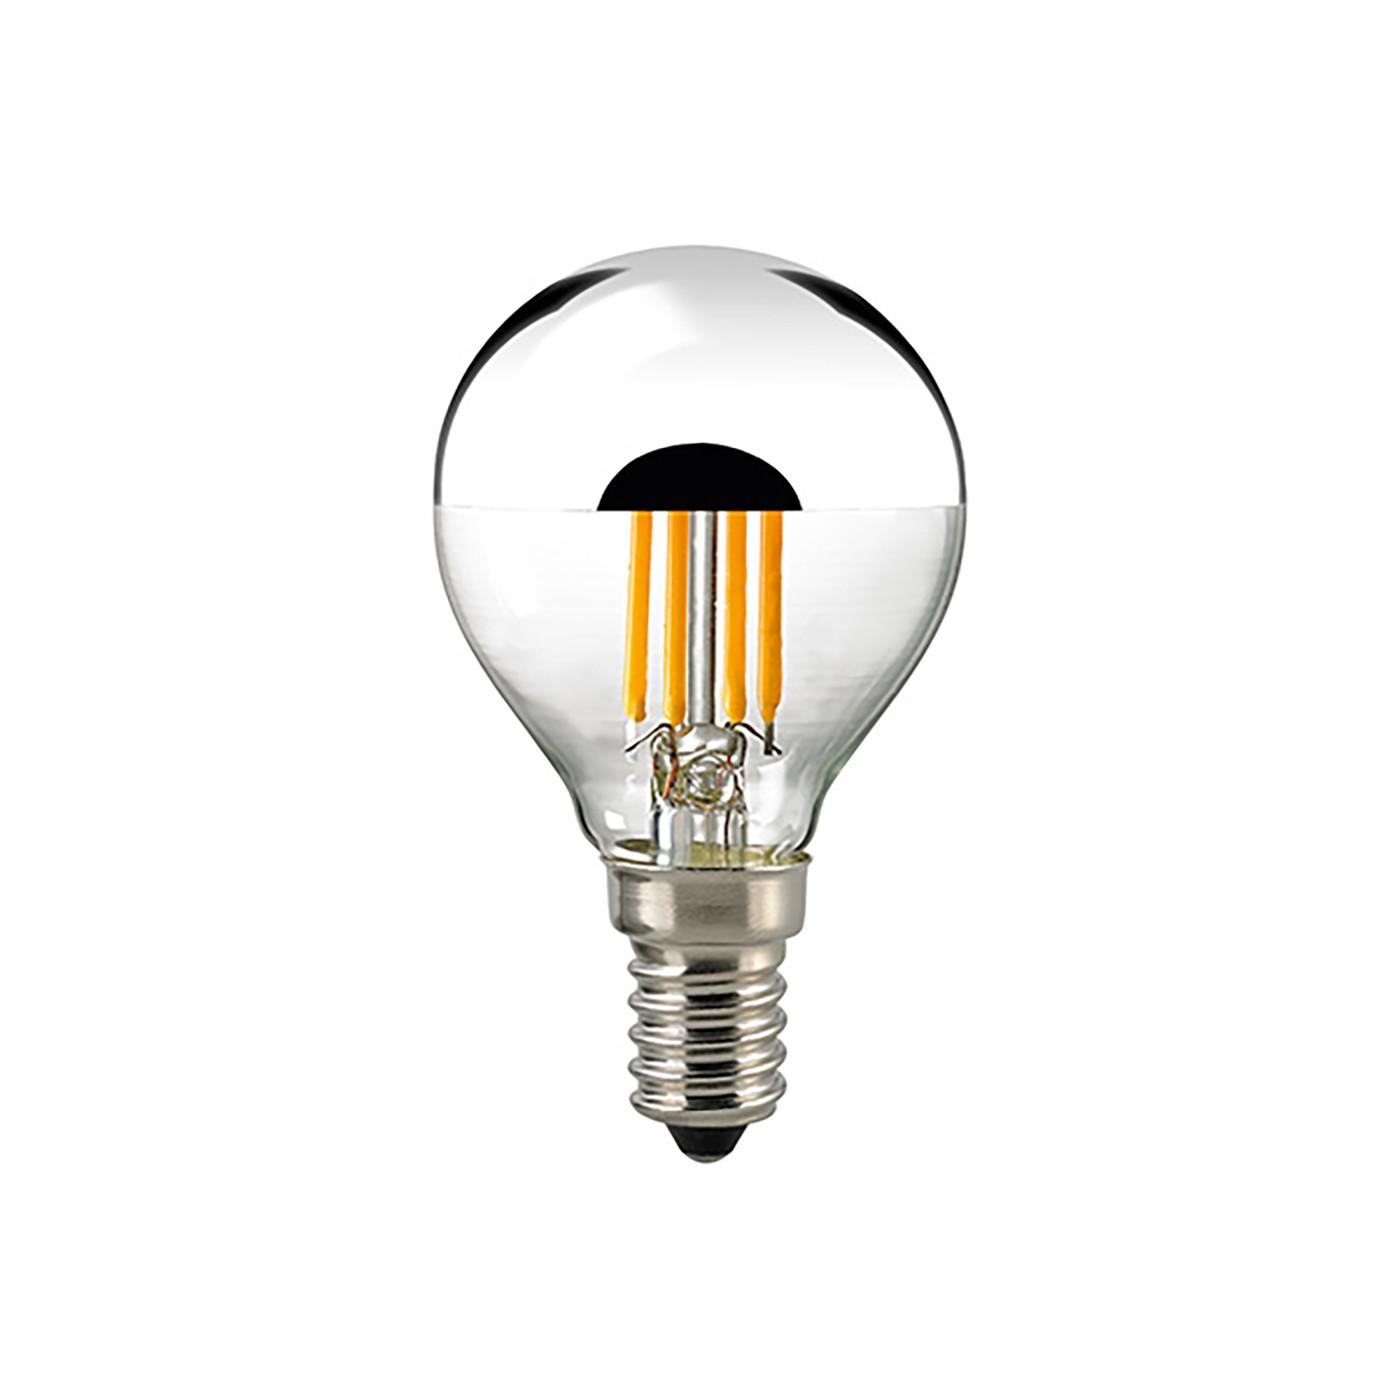 Sigor LED filament bulb shaped mirror head P45 4.5W 2700K 230V E27 clear